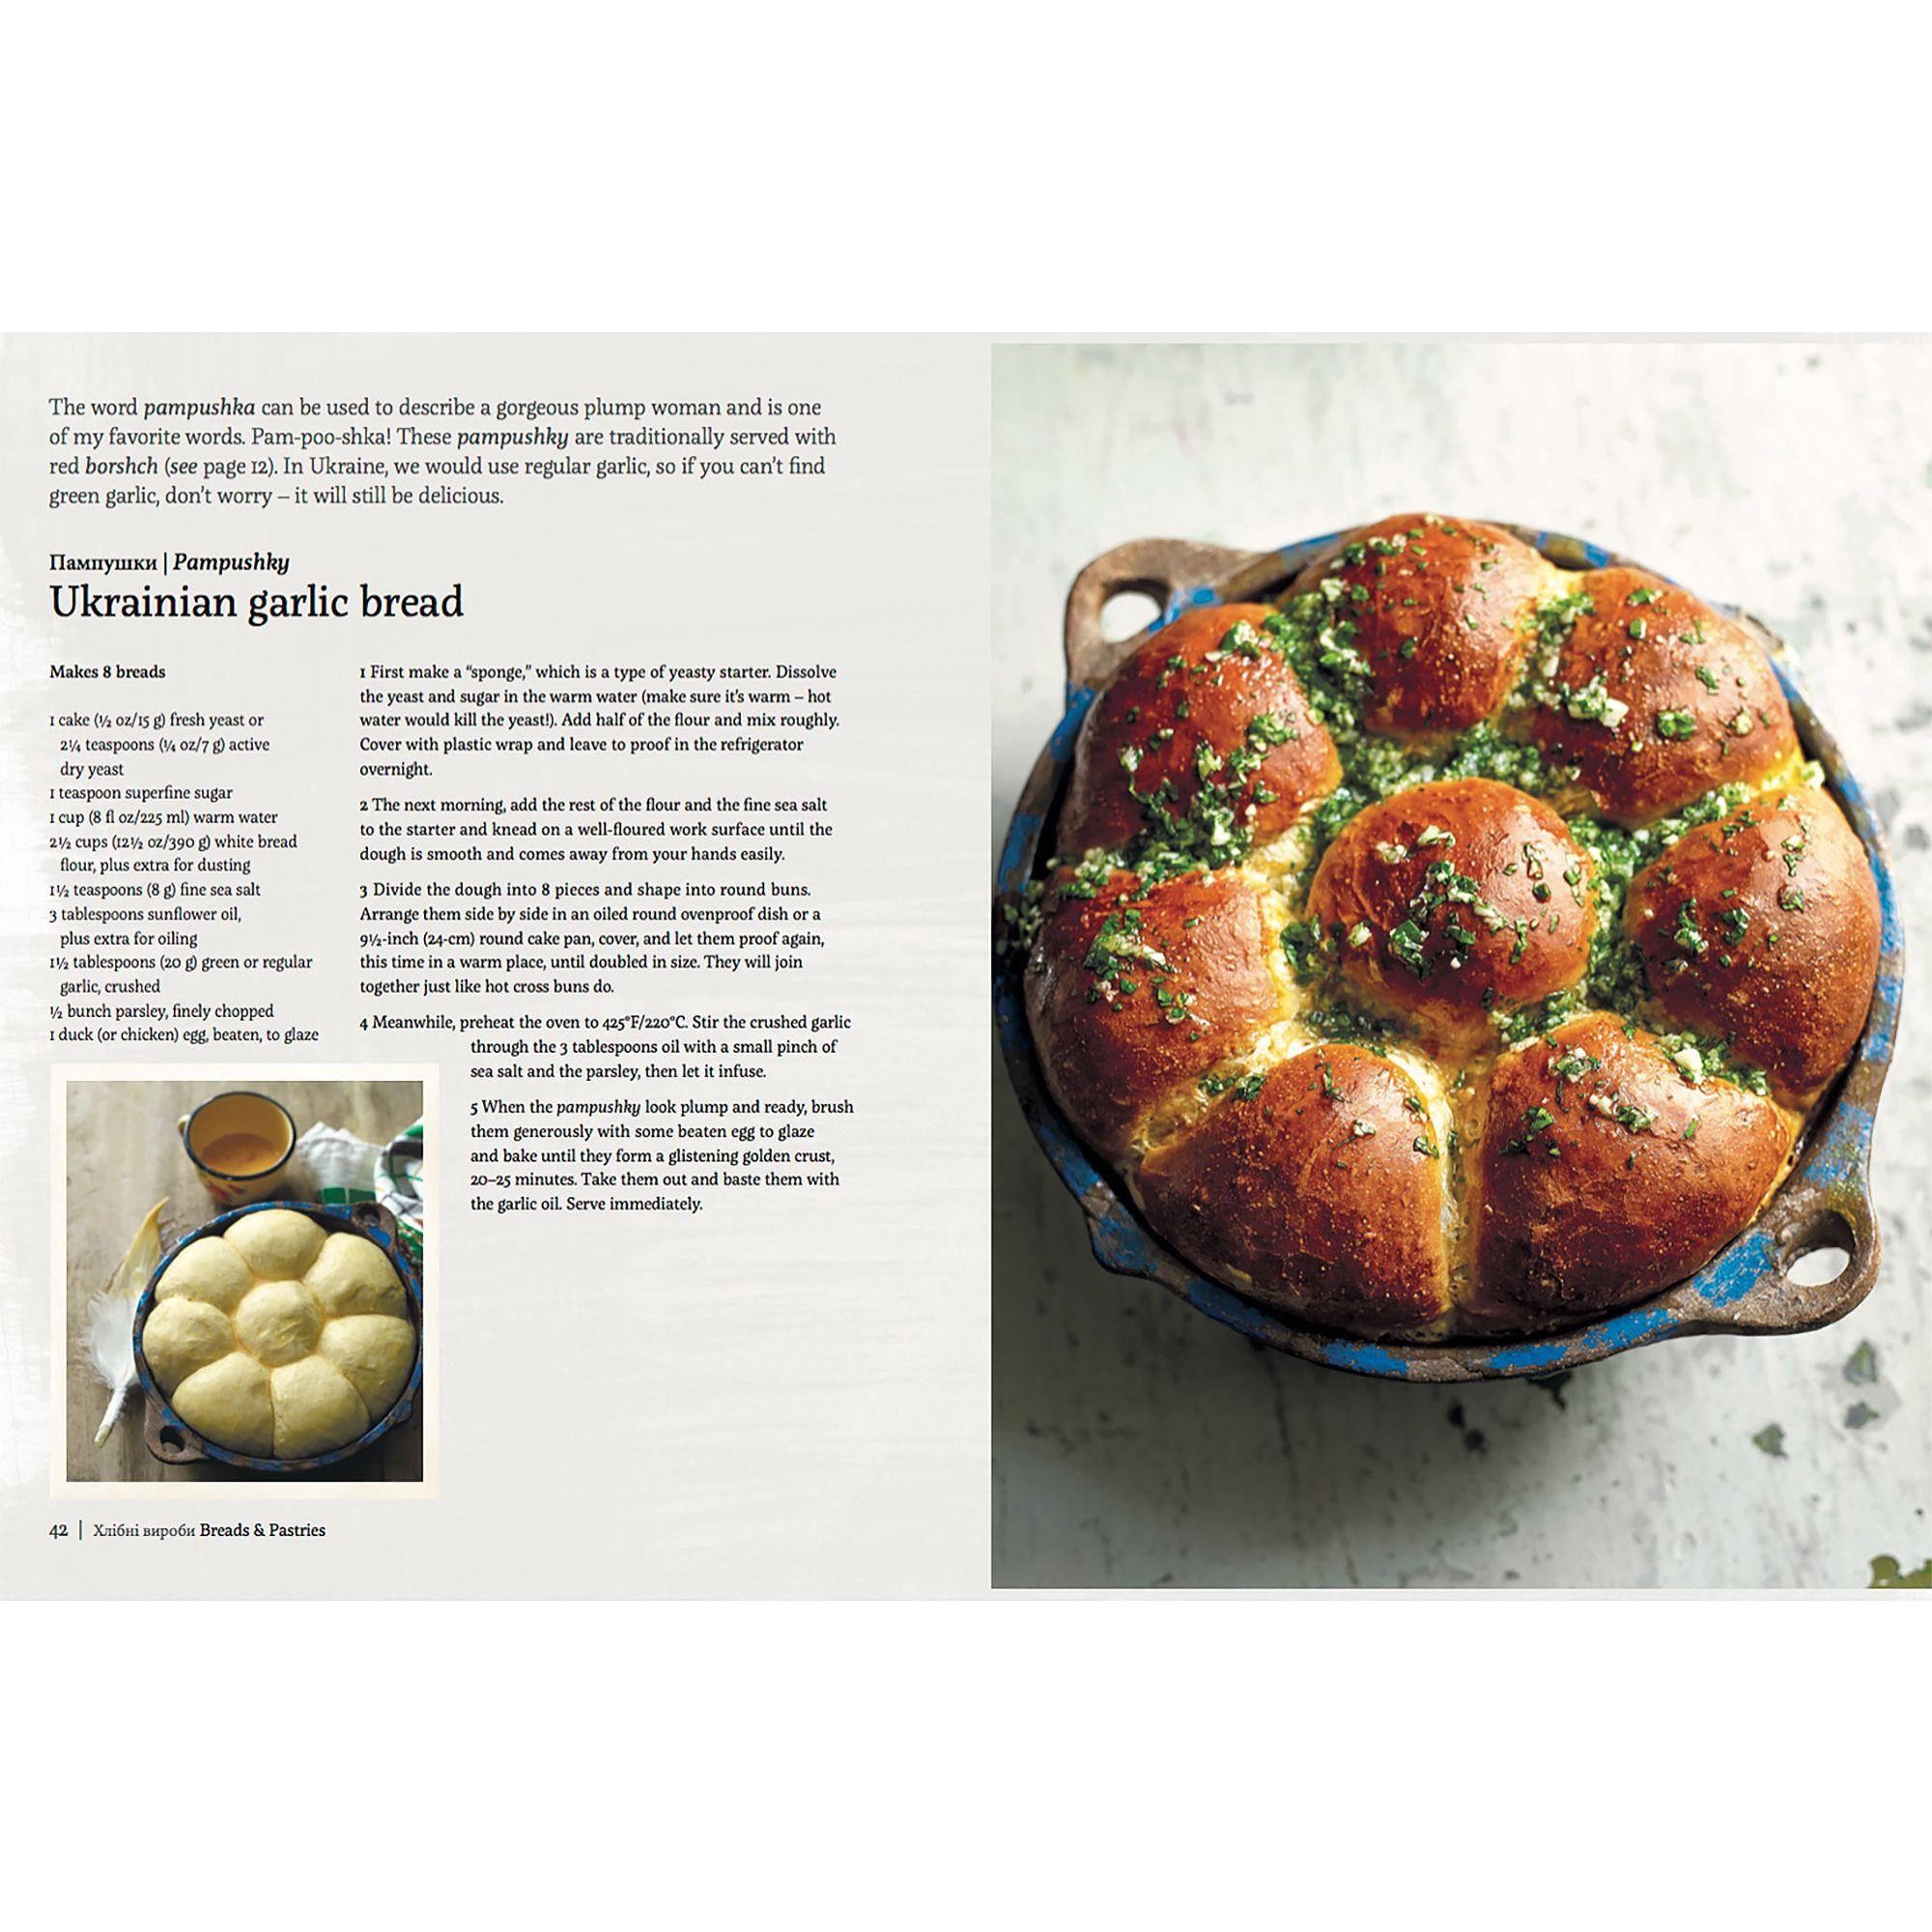 Mamushka recipes from ukraine and eastern europe on food52 forumfinder Images